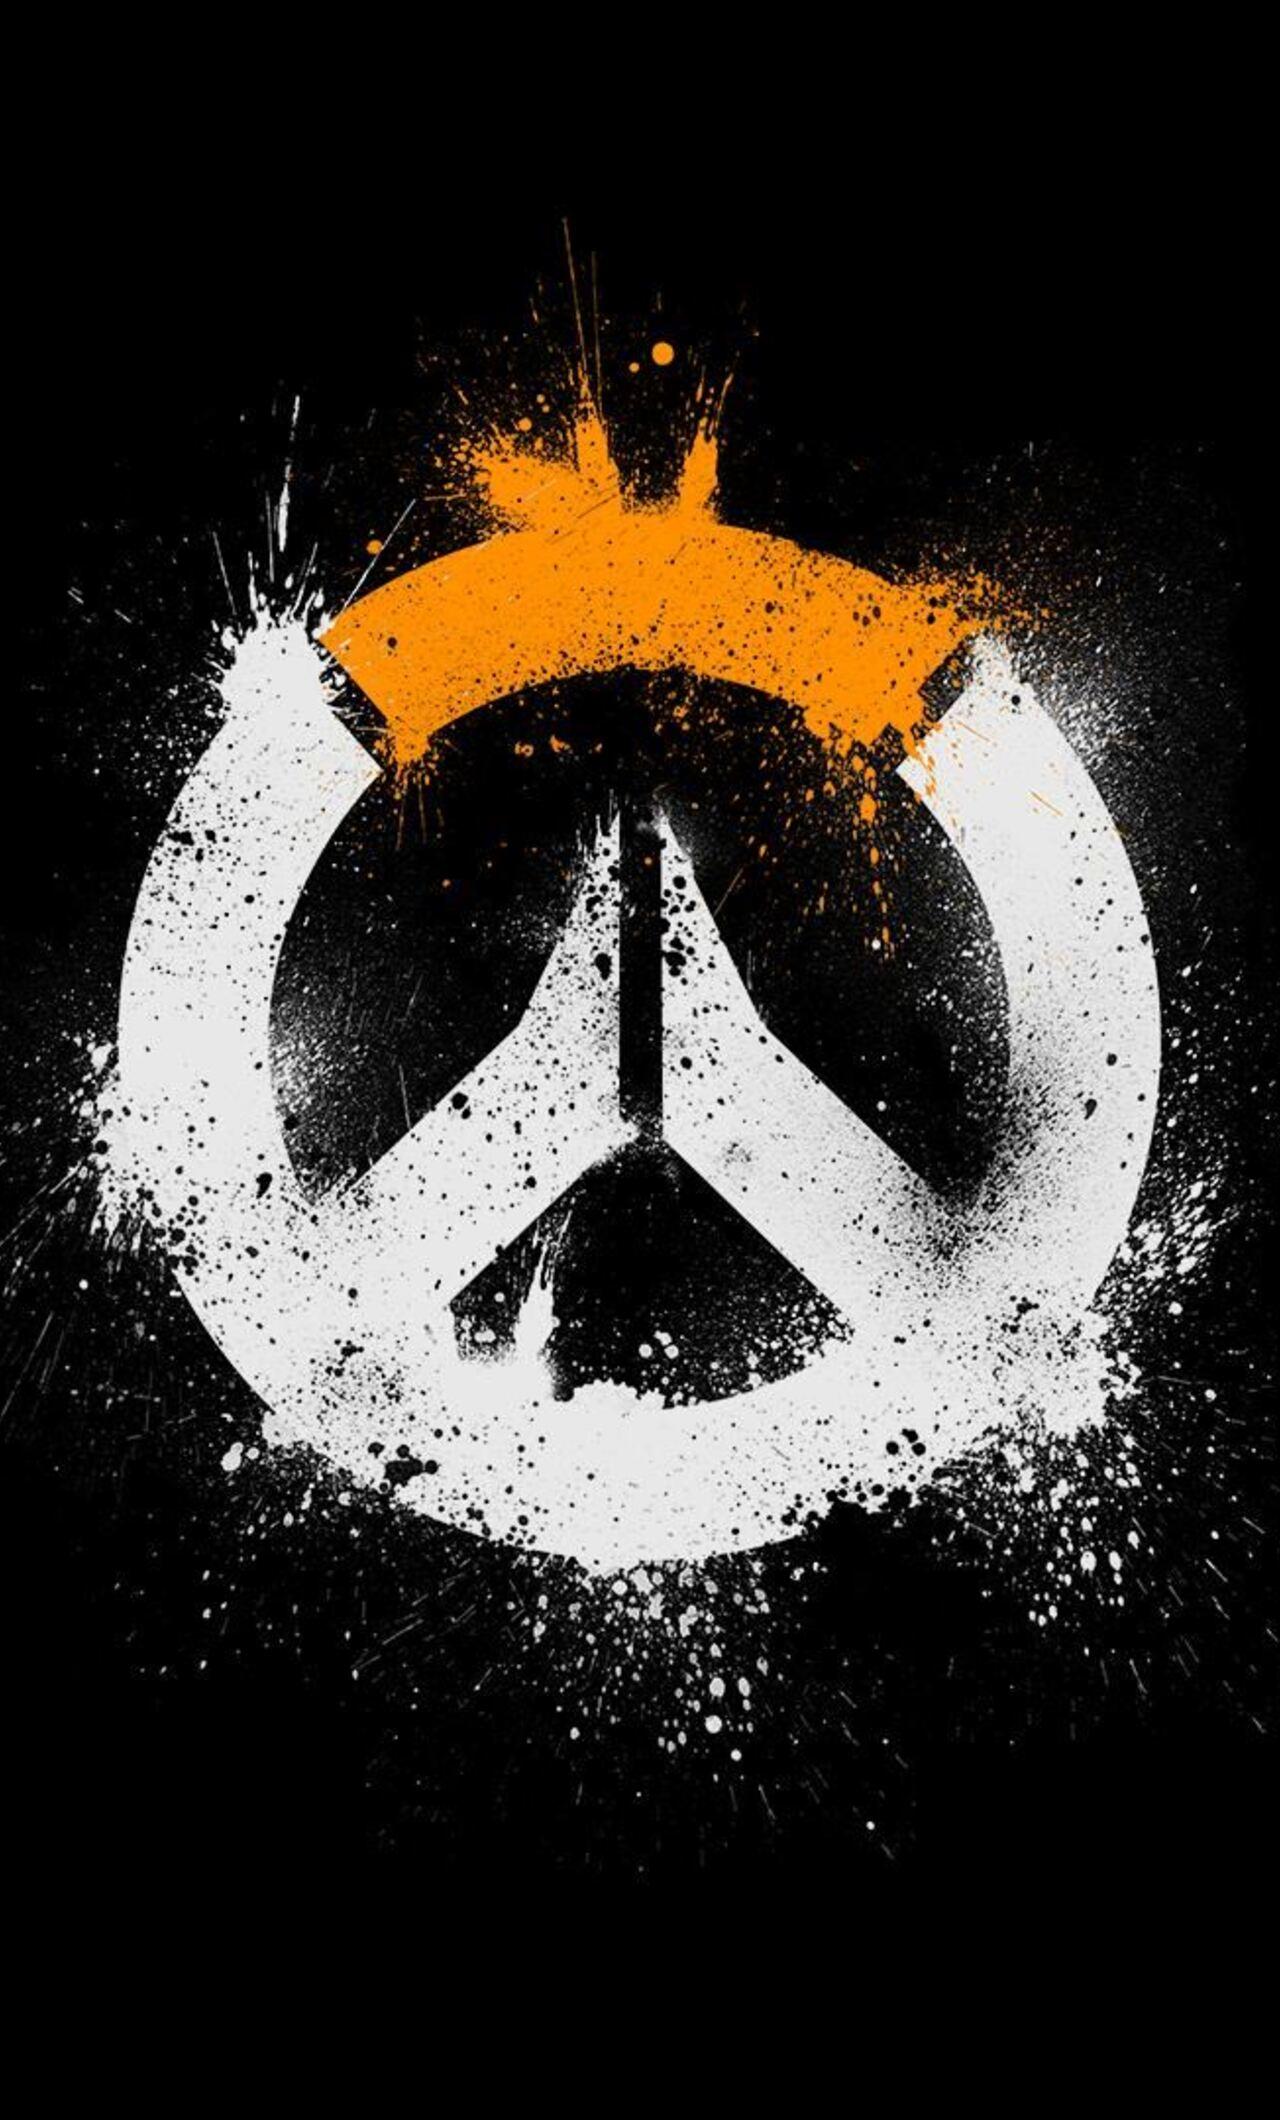 overwatch-logo-hd-pic.jpg